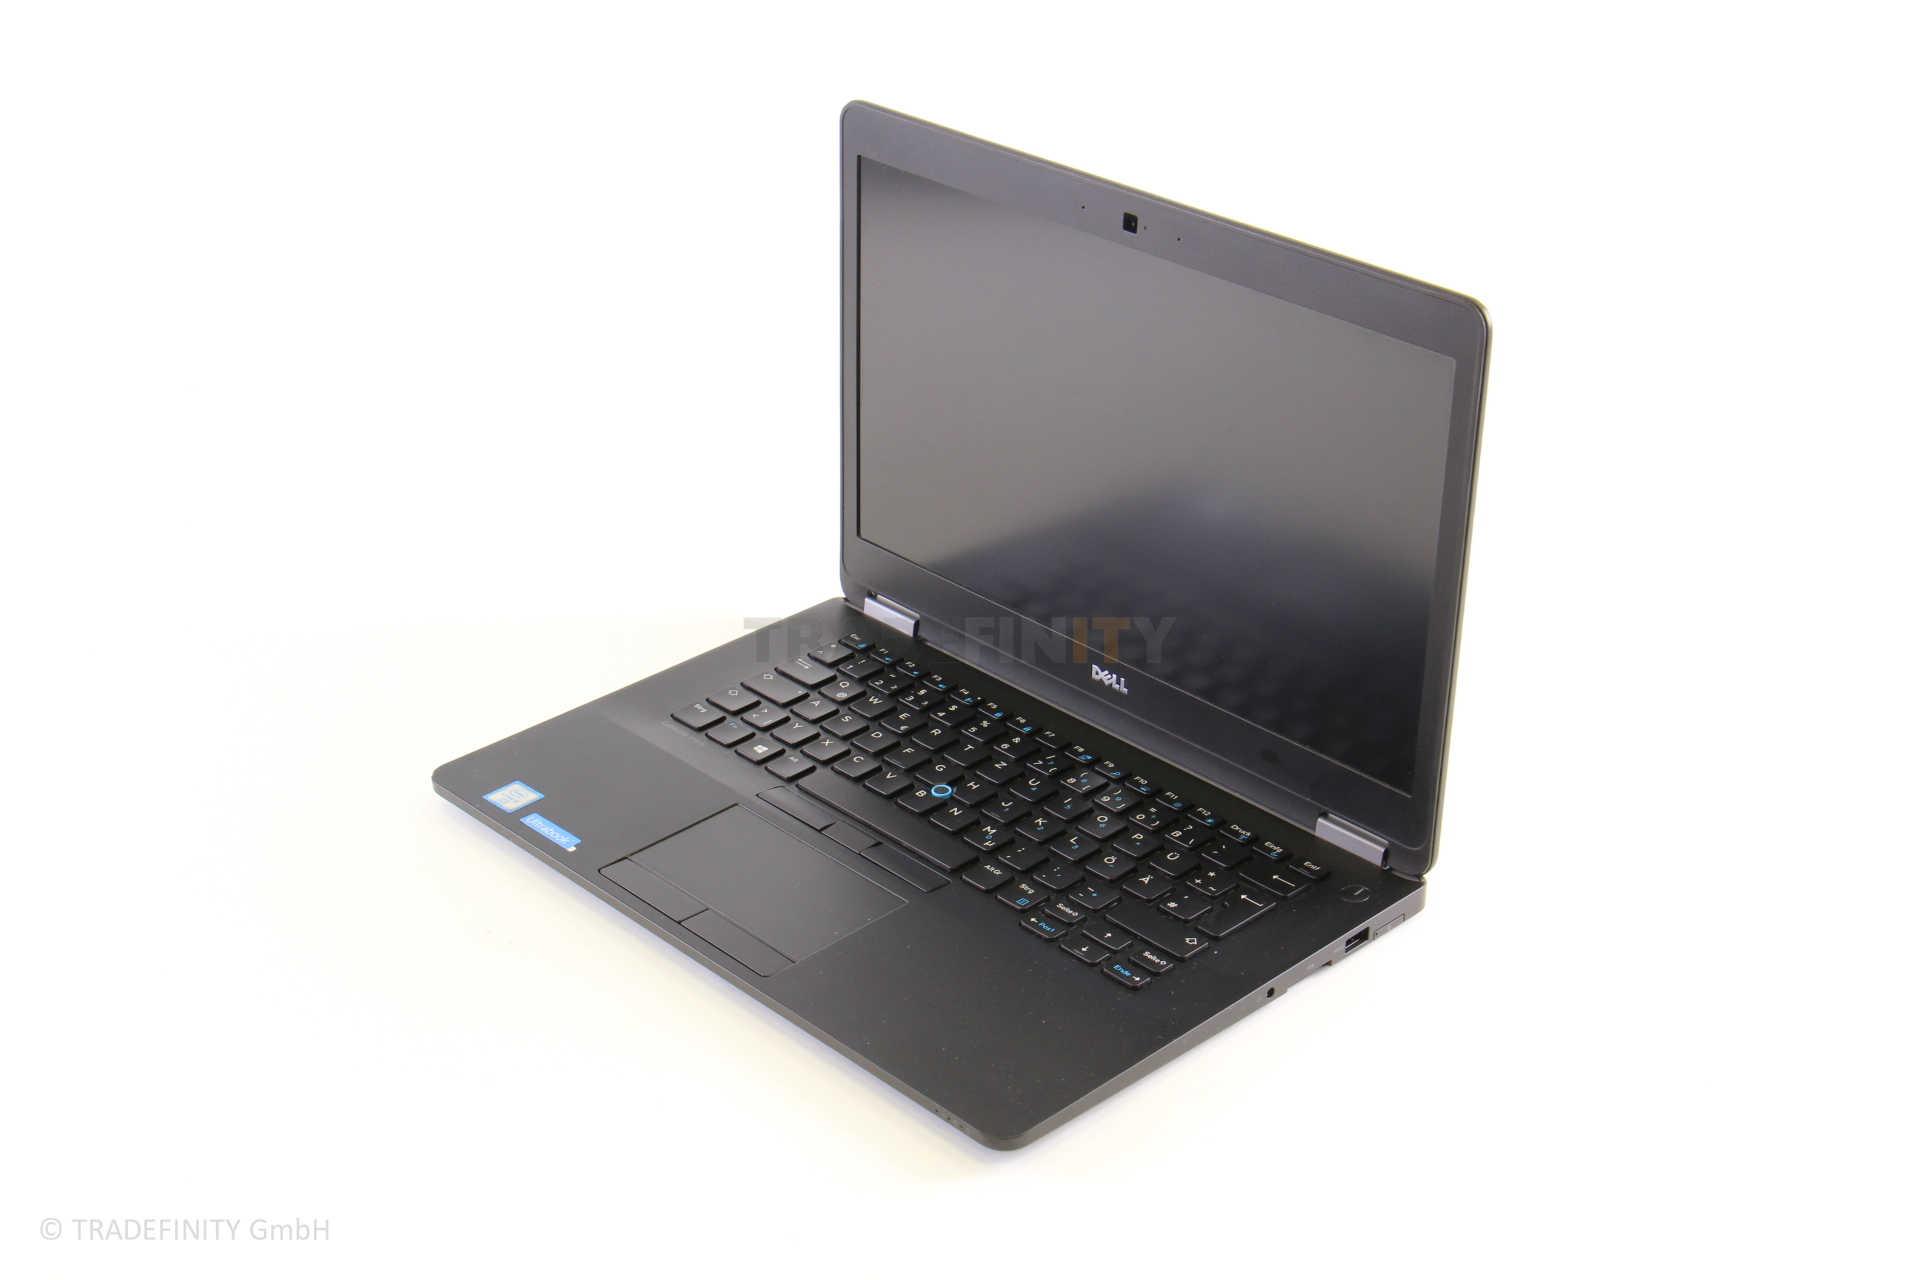 Latitude E7470 Notebook (14) 1366 x 768 WXGA Matt w/o Battery